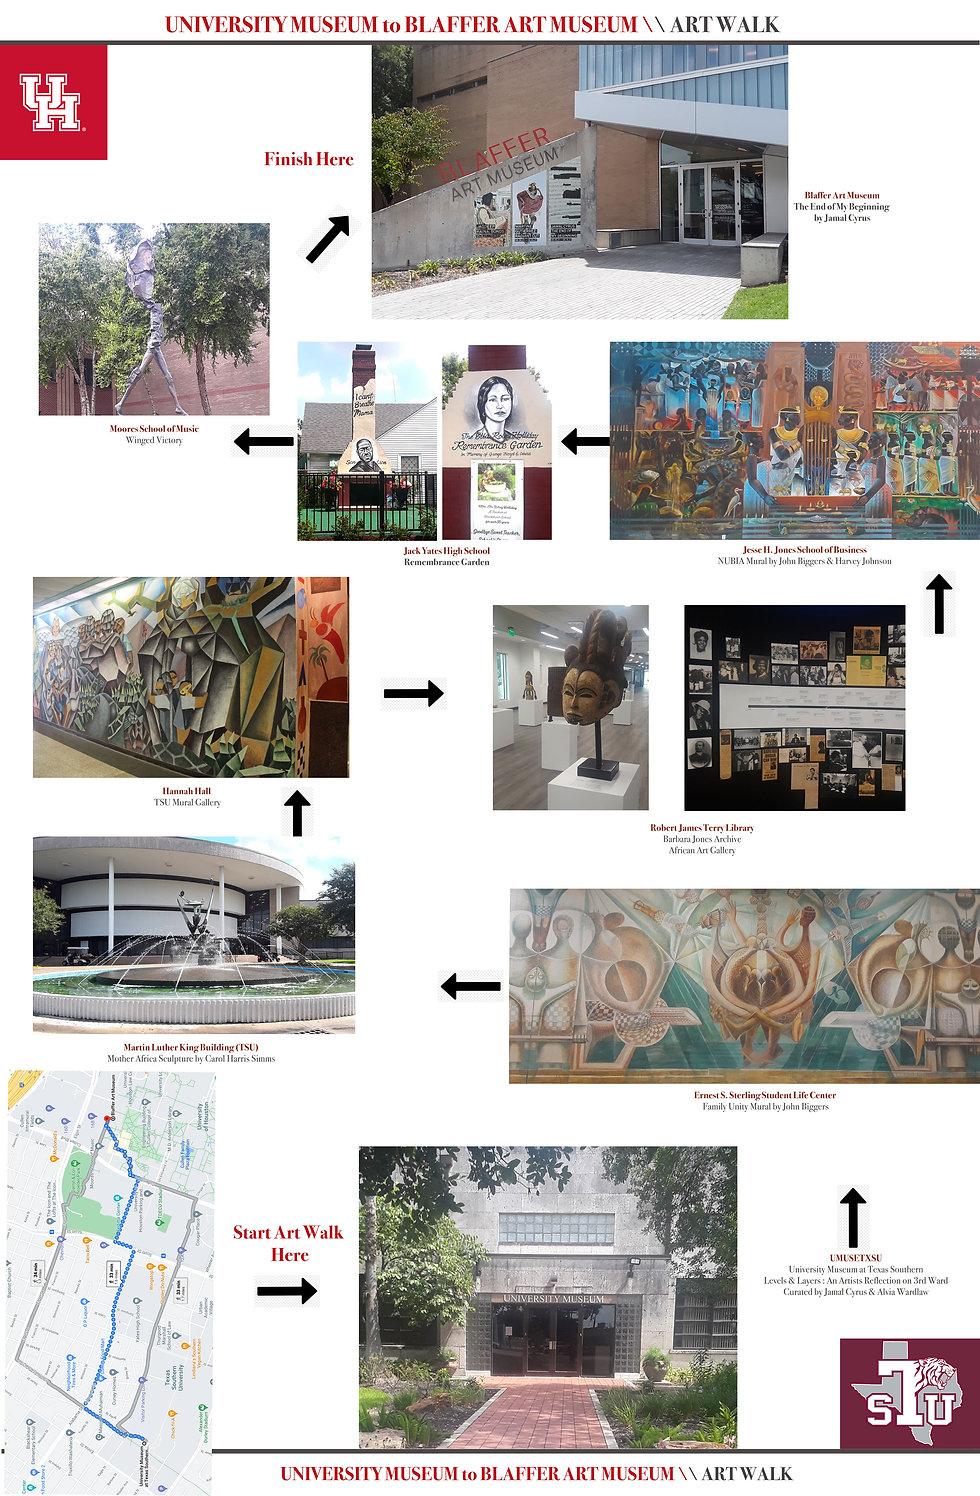 artwalkmap.jpg